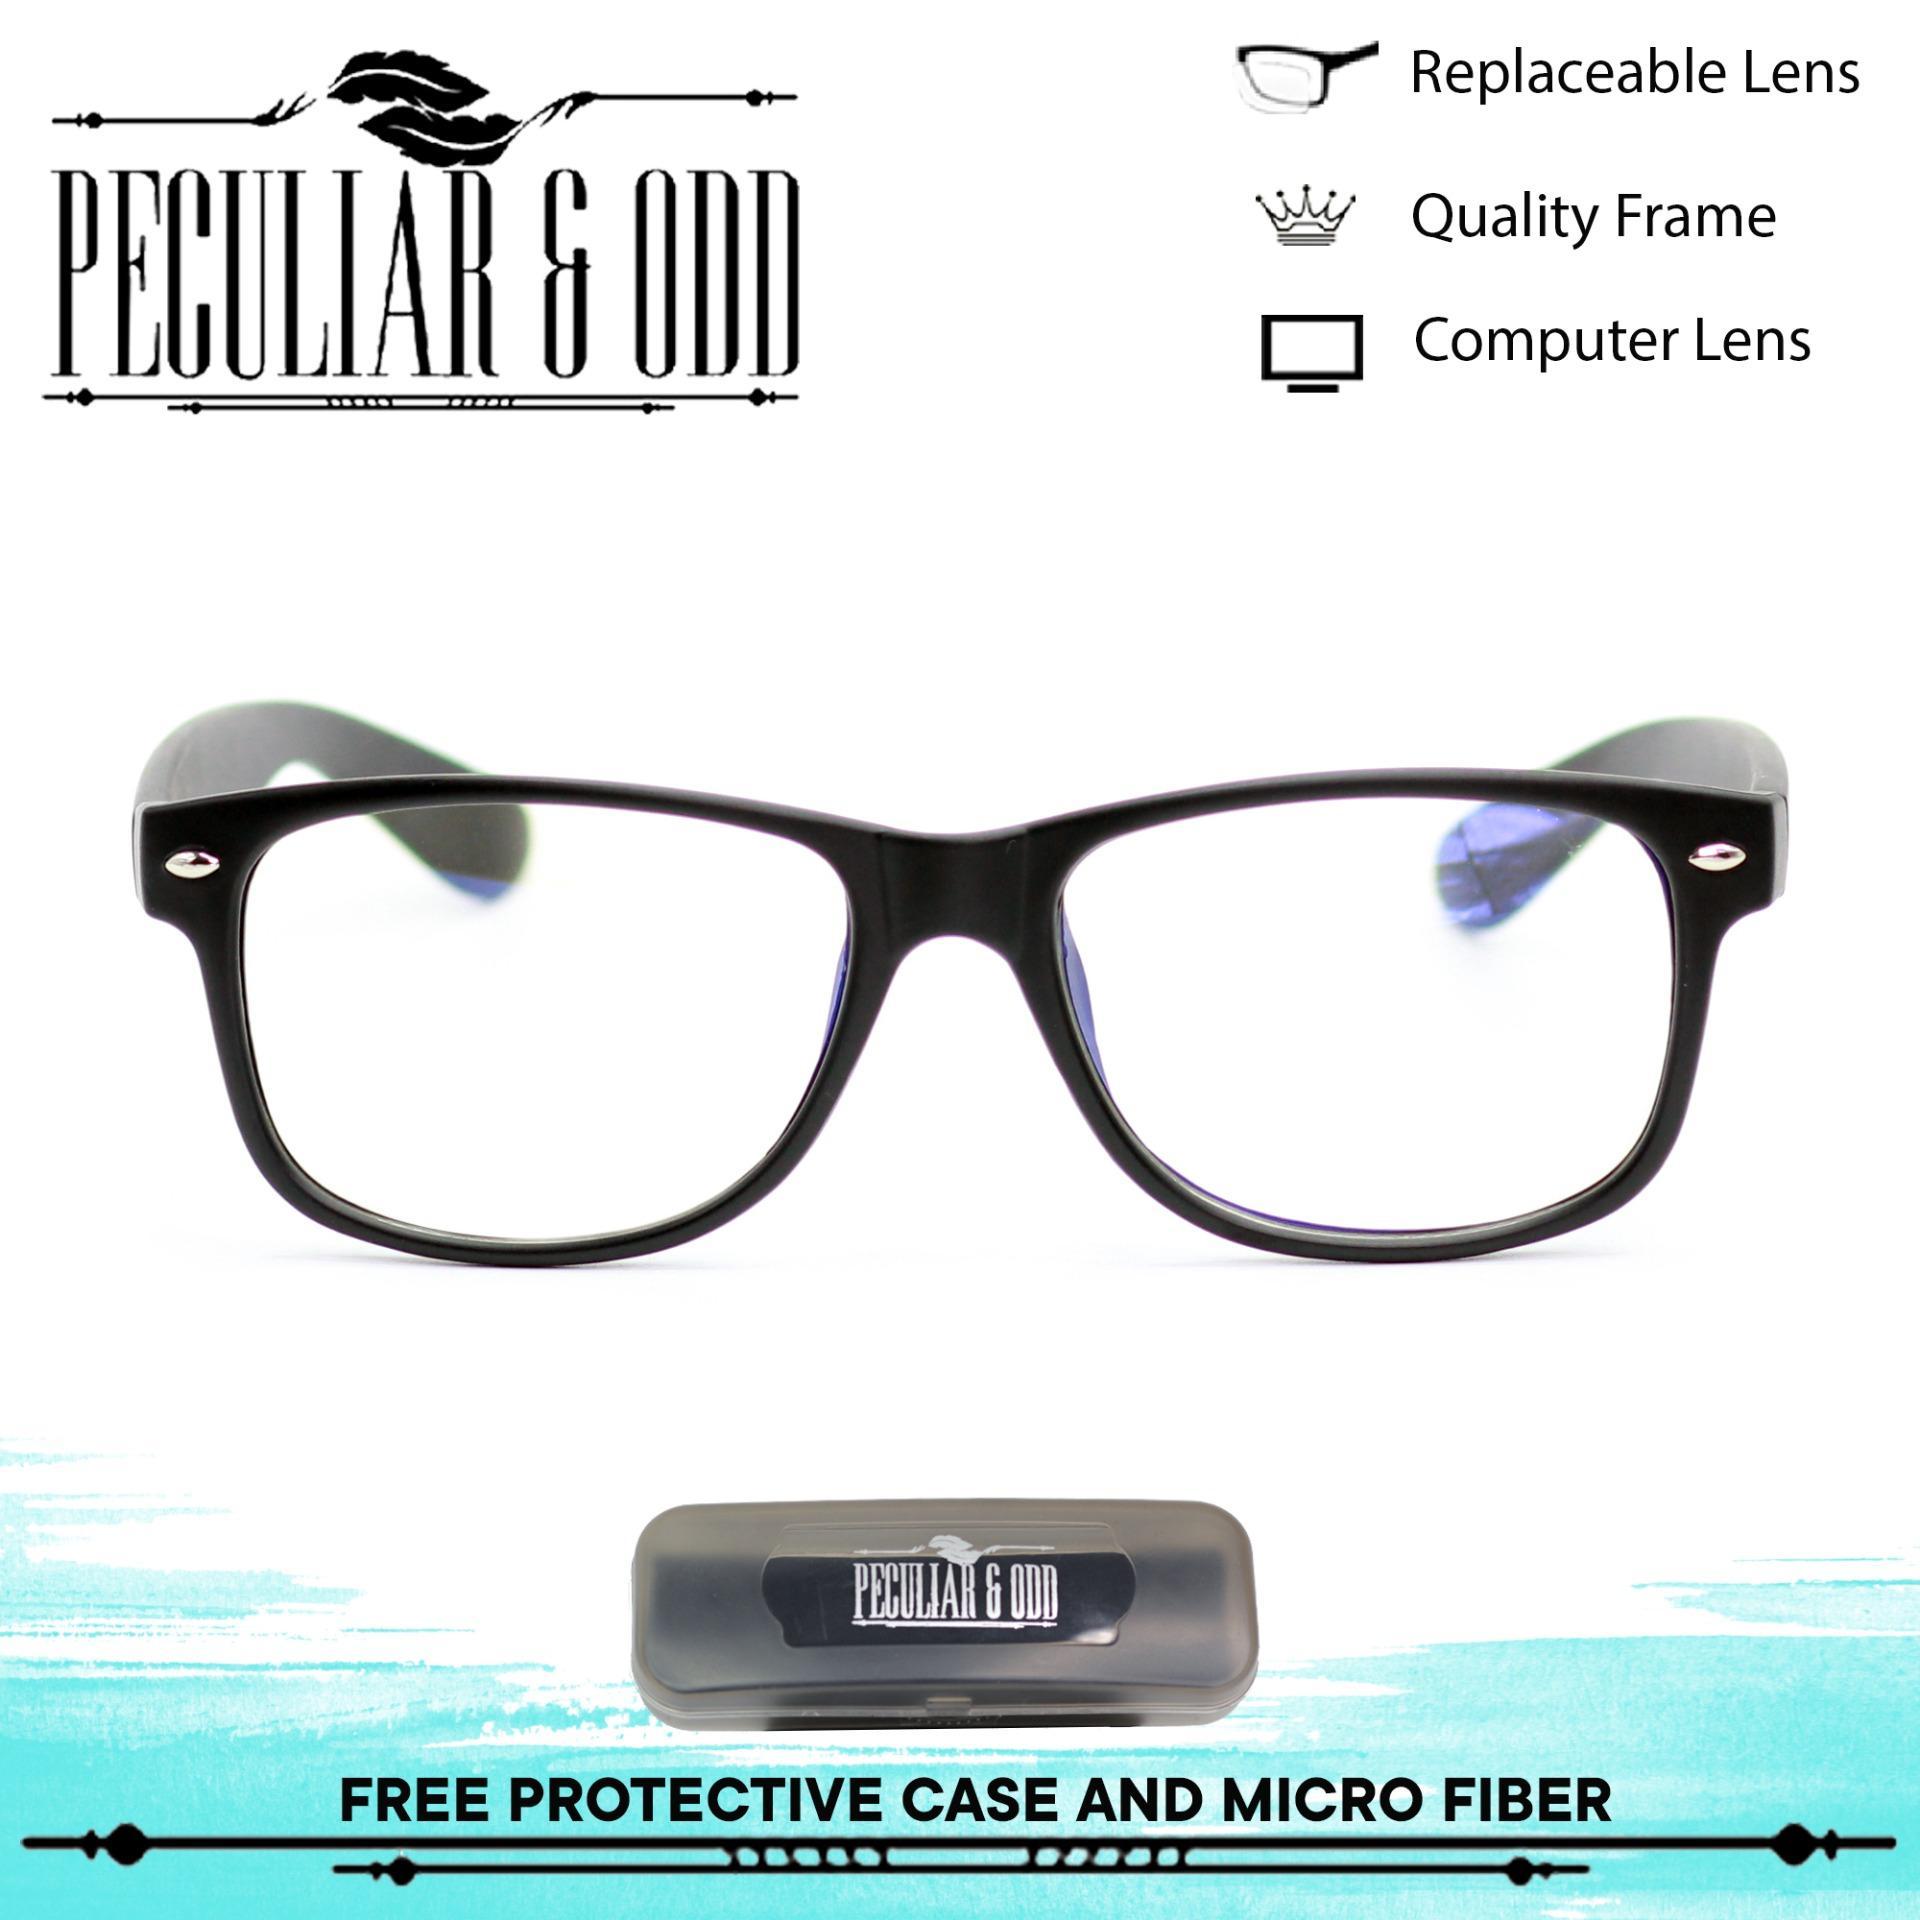 Peculiar Square 8081 BlackClear Anti Radiation Computer Eyeglass Optical  Replaceable Unisex Eyewear 2 3cc8bb172